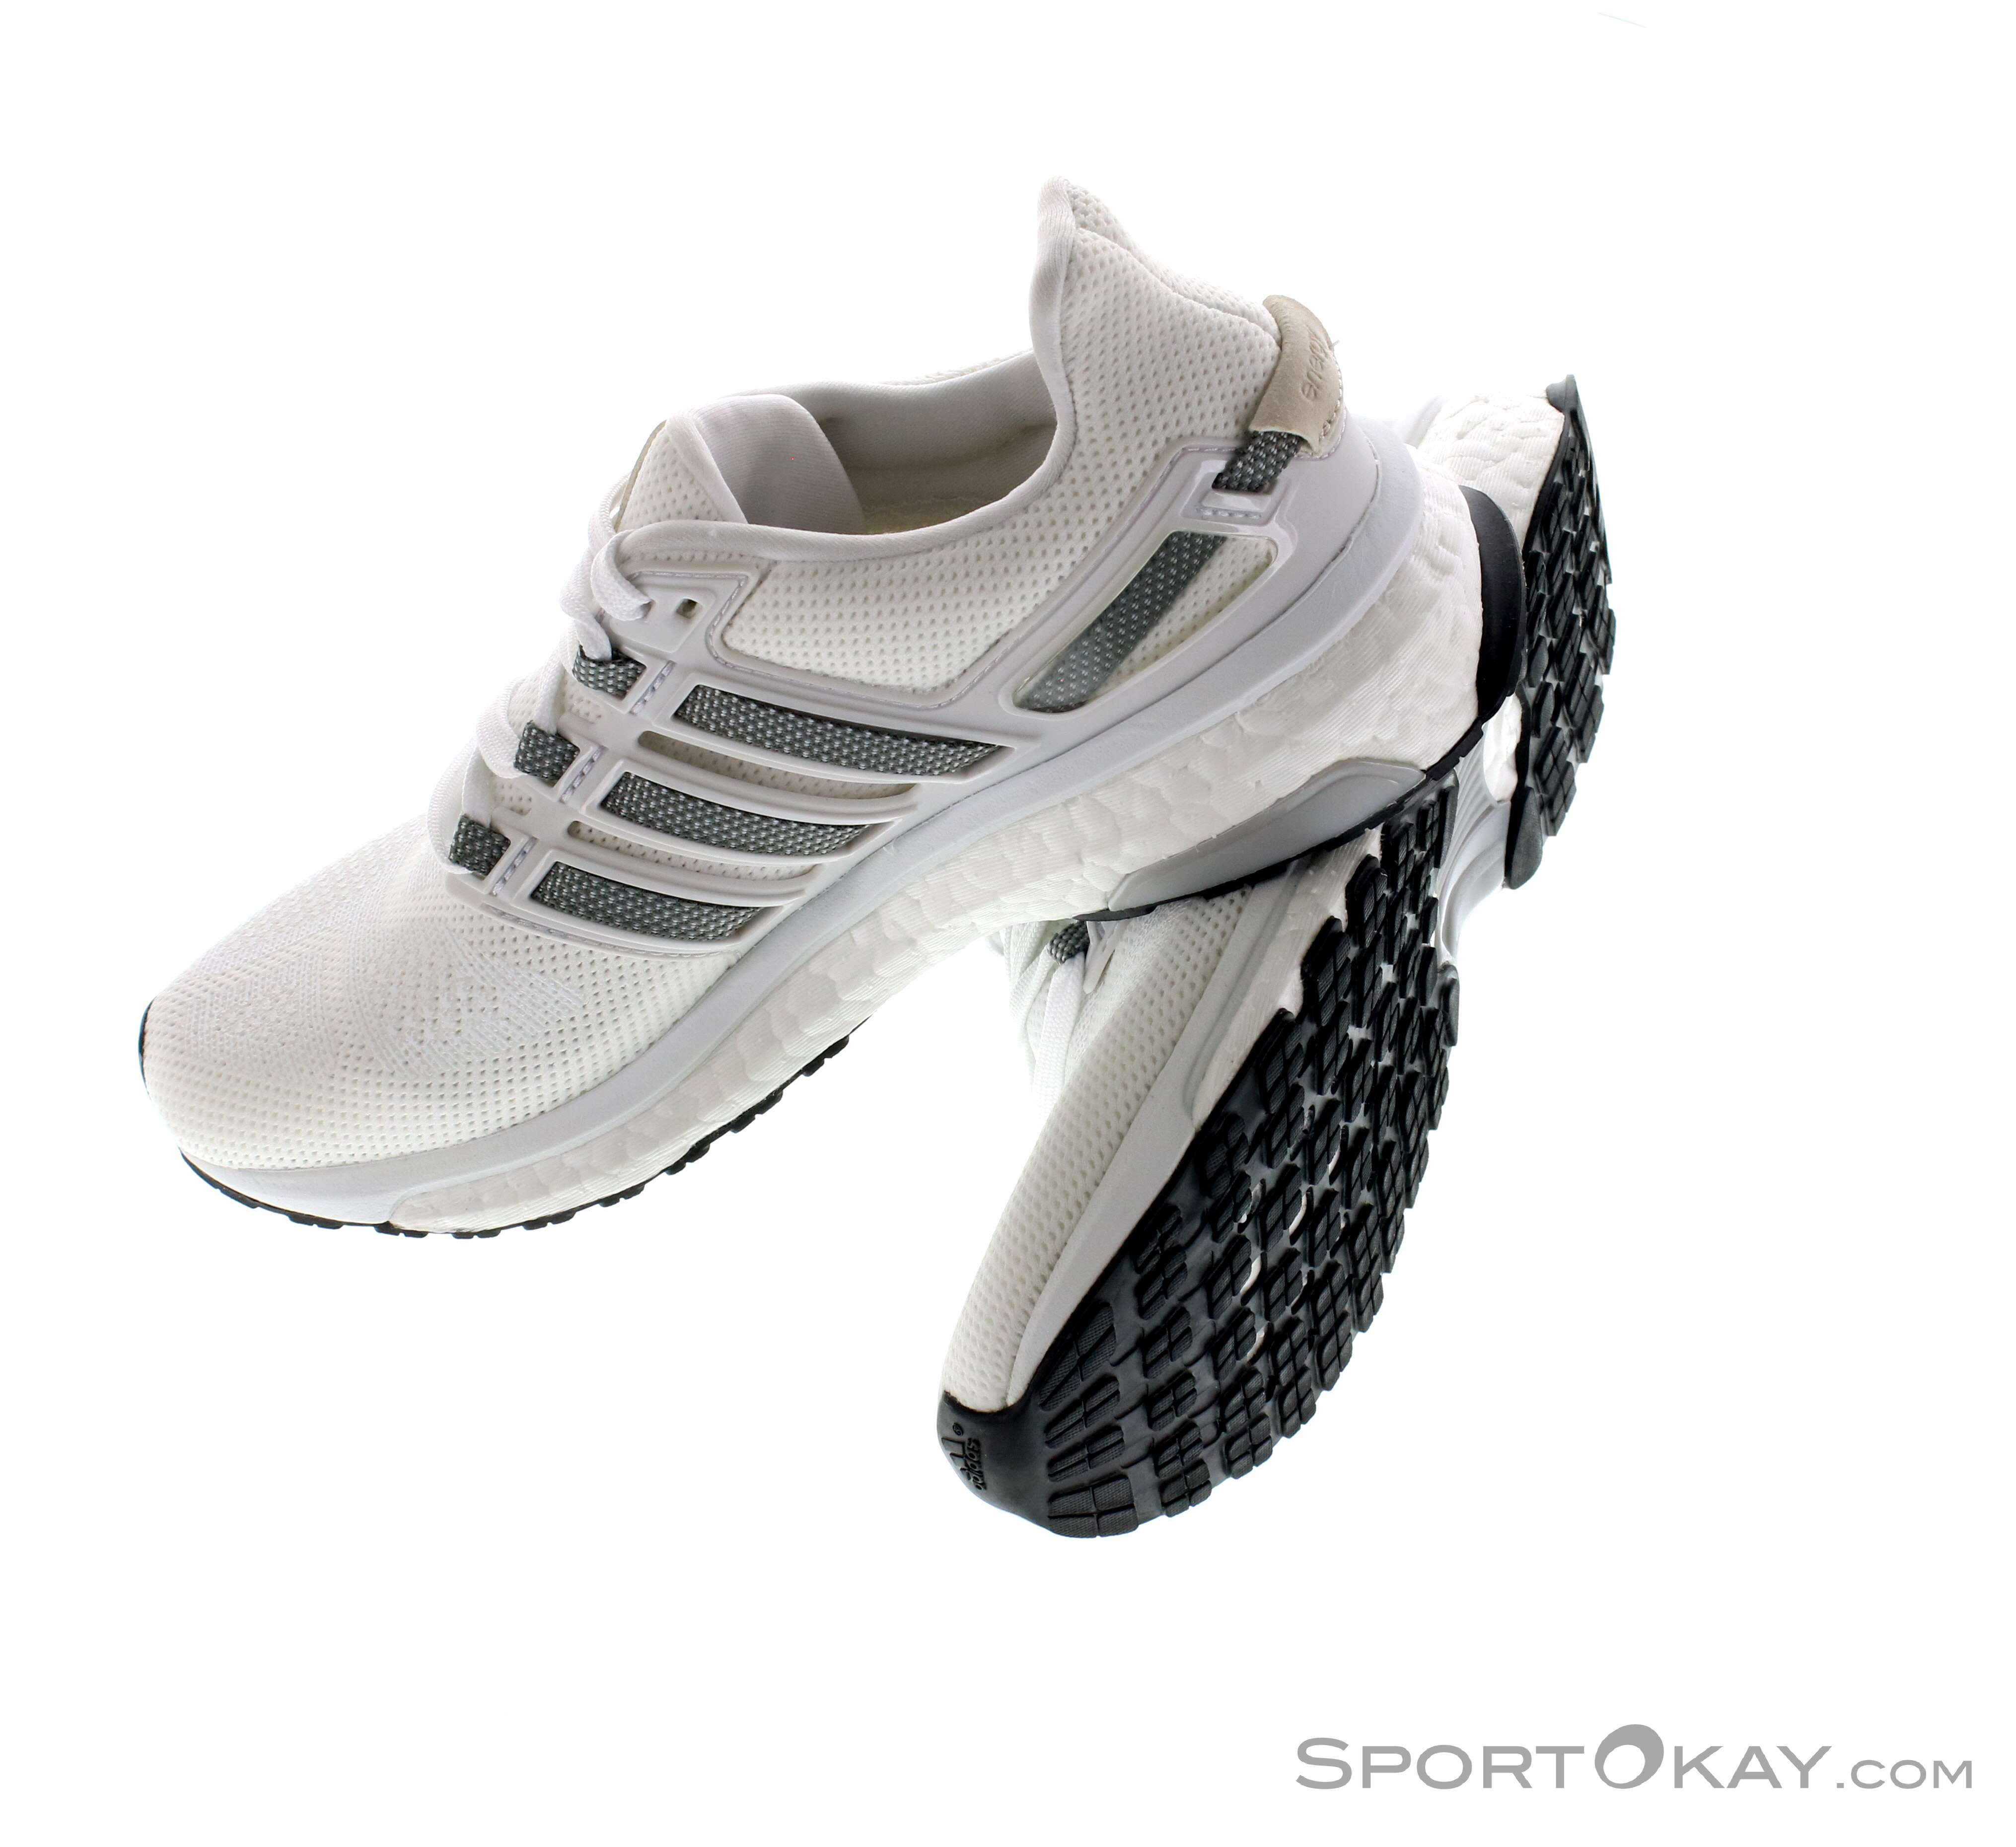 631398ea904c46 adidas Energy Boost 3 W Damen Laufschuhe - Straßenlaufschuhe ...